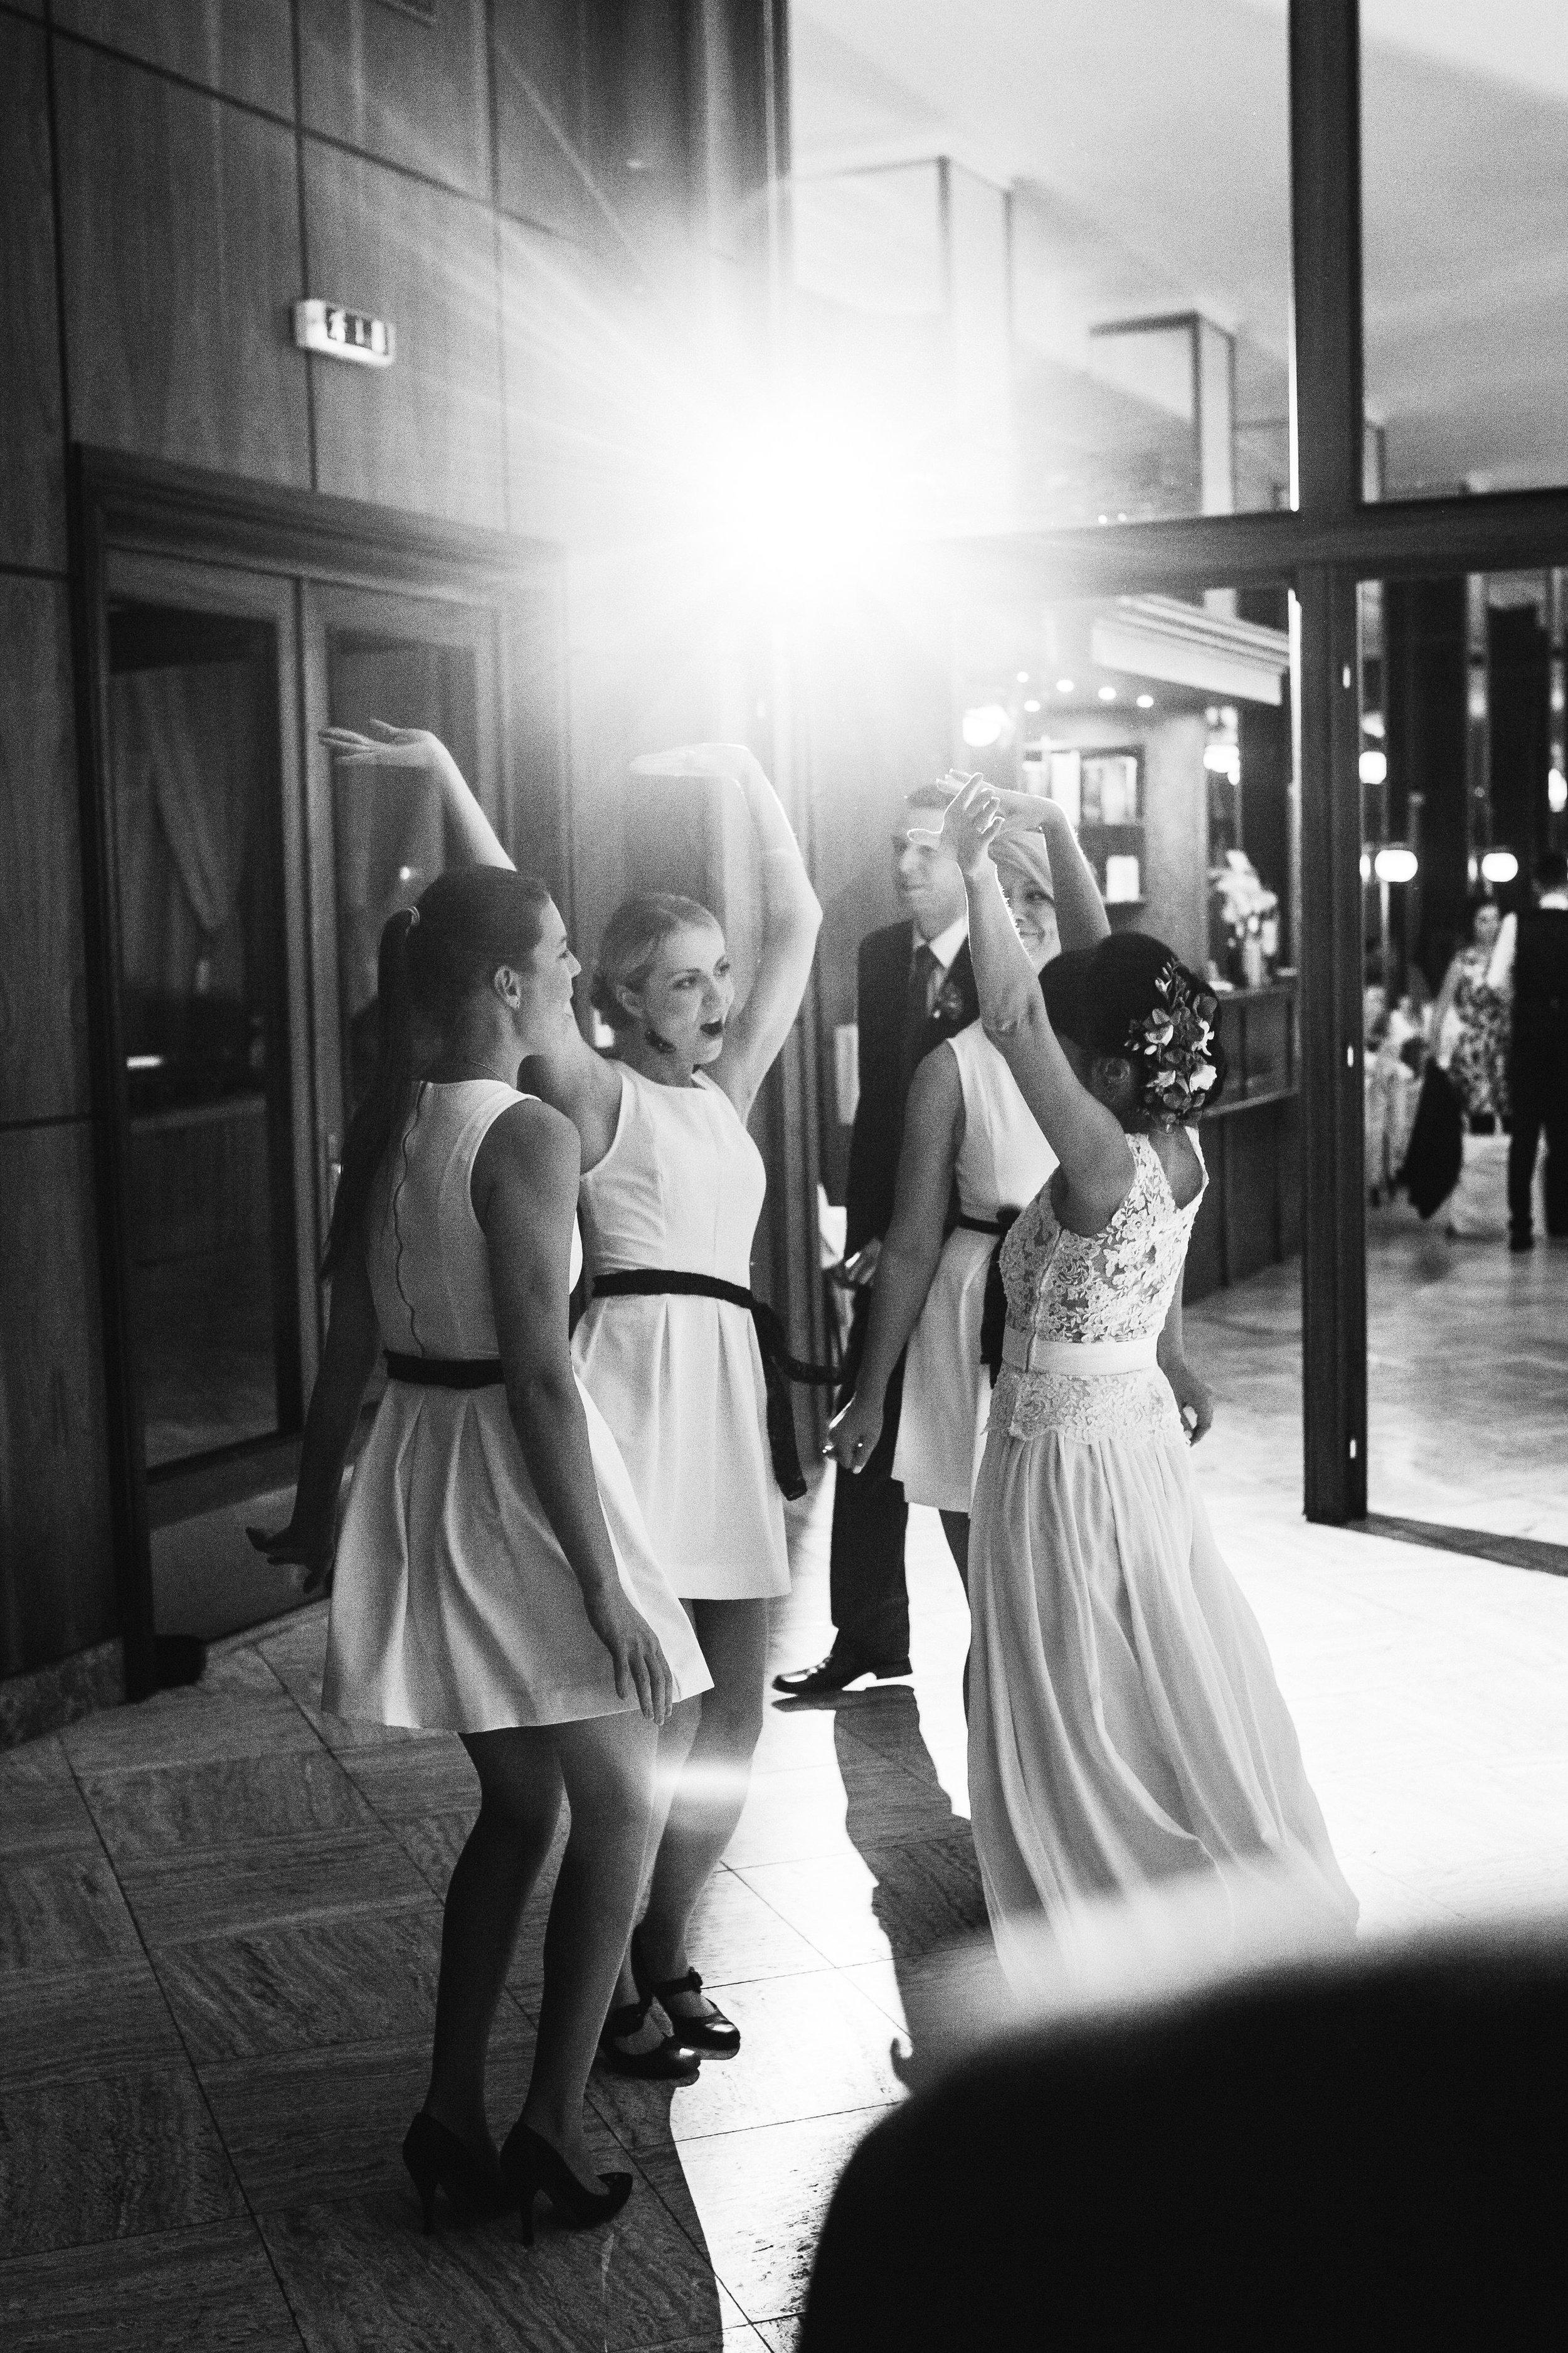 destination-wedding-photographer-slovakia-bratislava-bw-documentary-style-dancing-bridesmaids.jpg